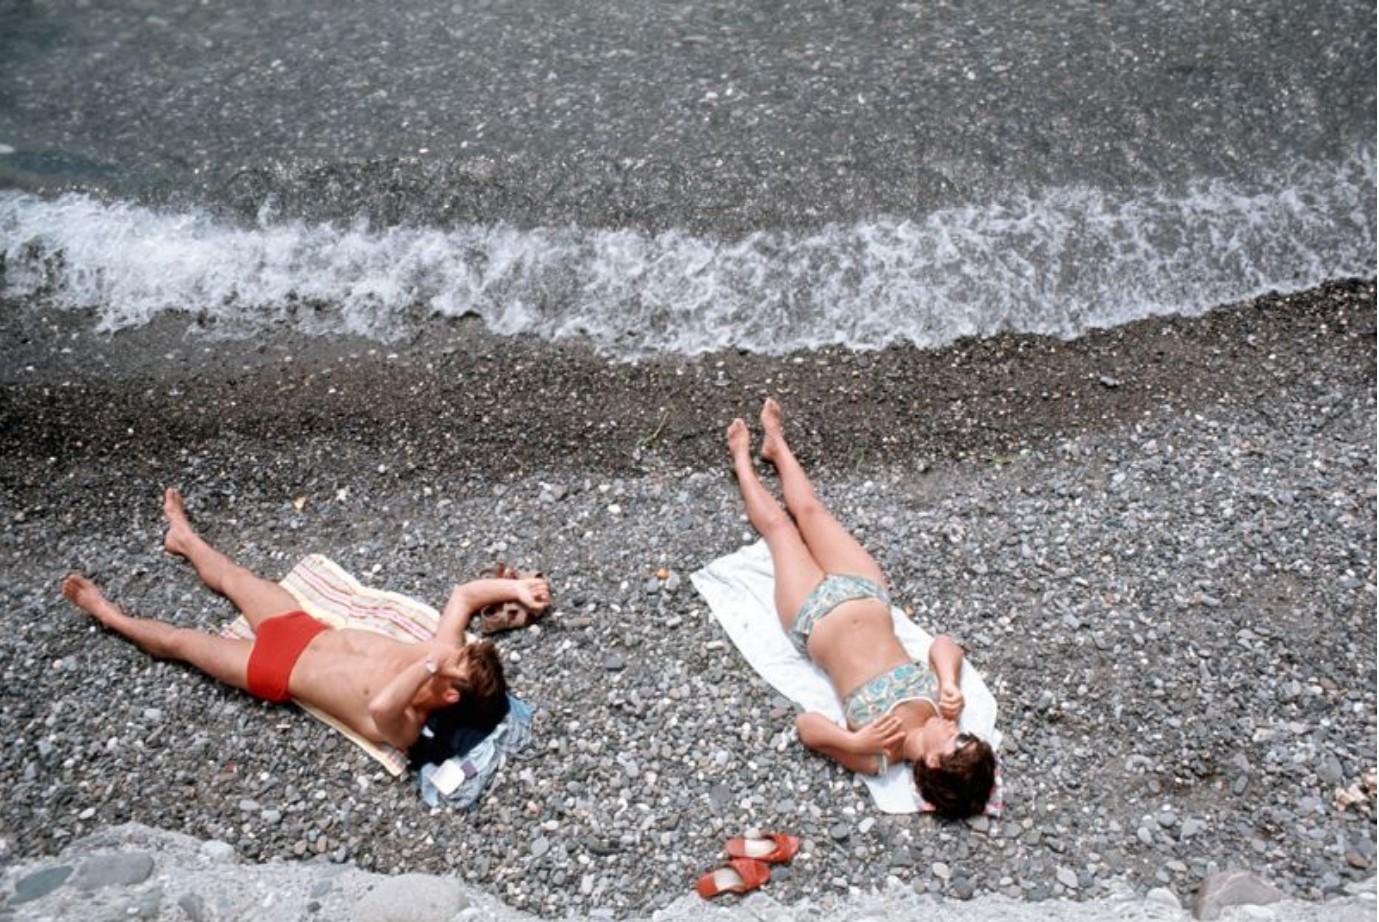 Мужчина и женщина загорают на берегу Ангары